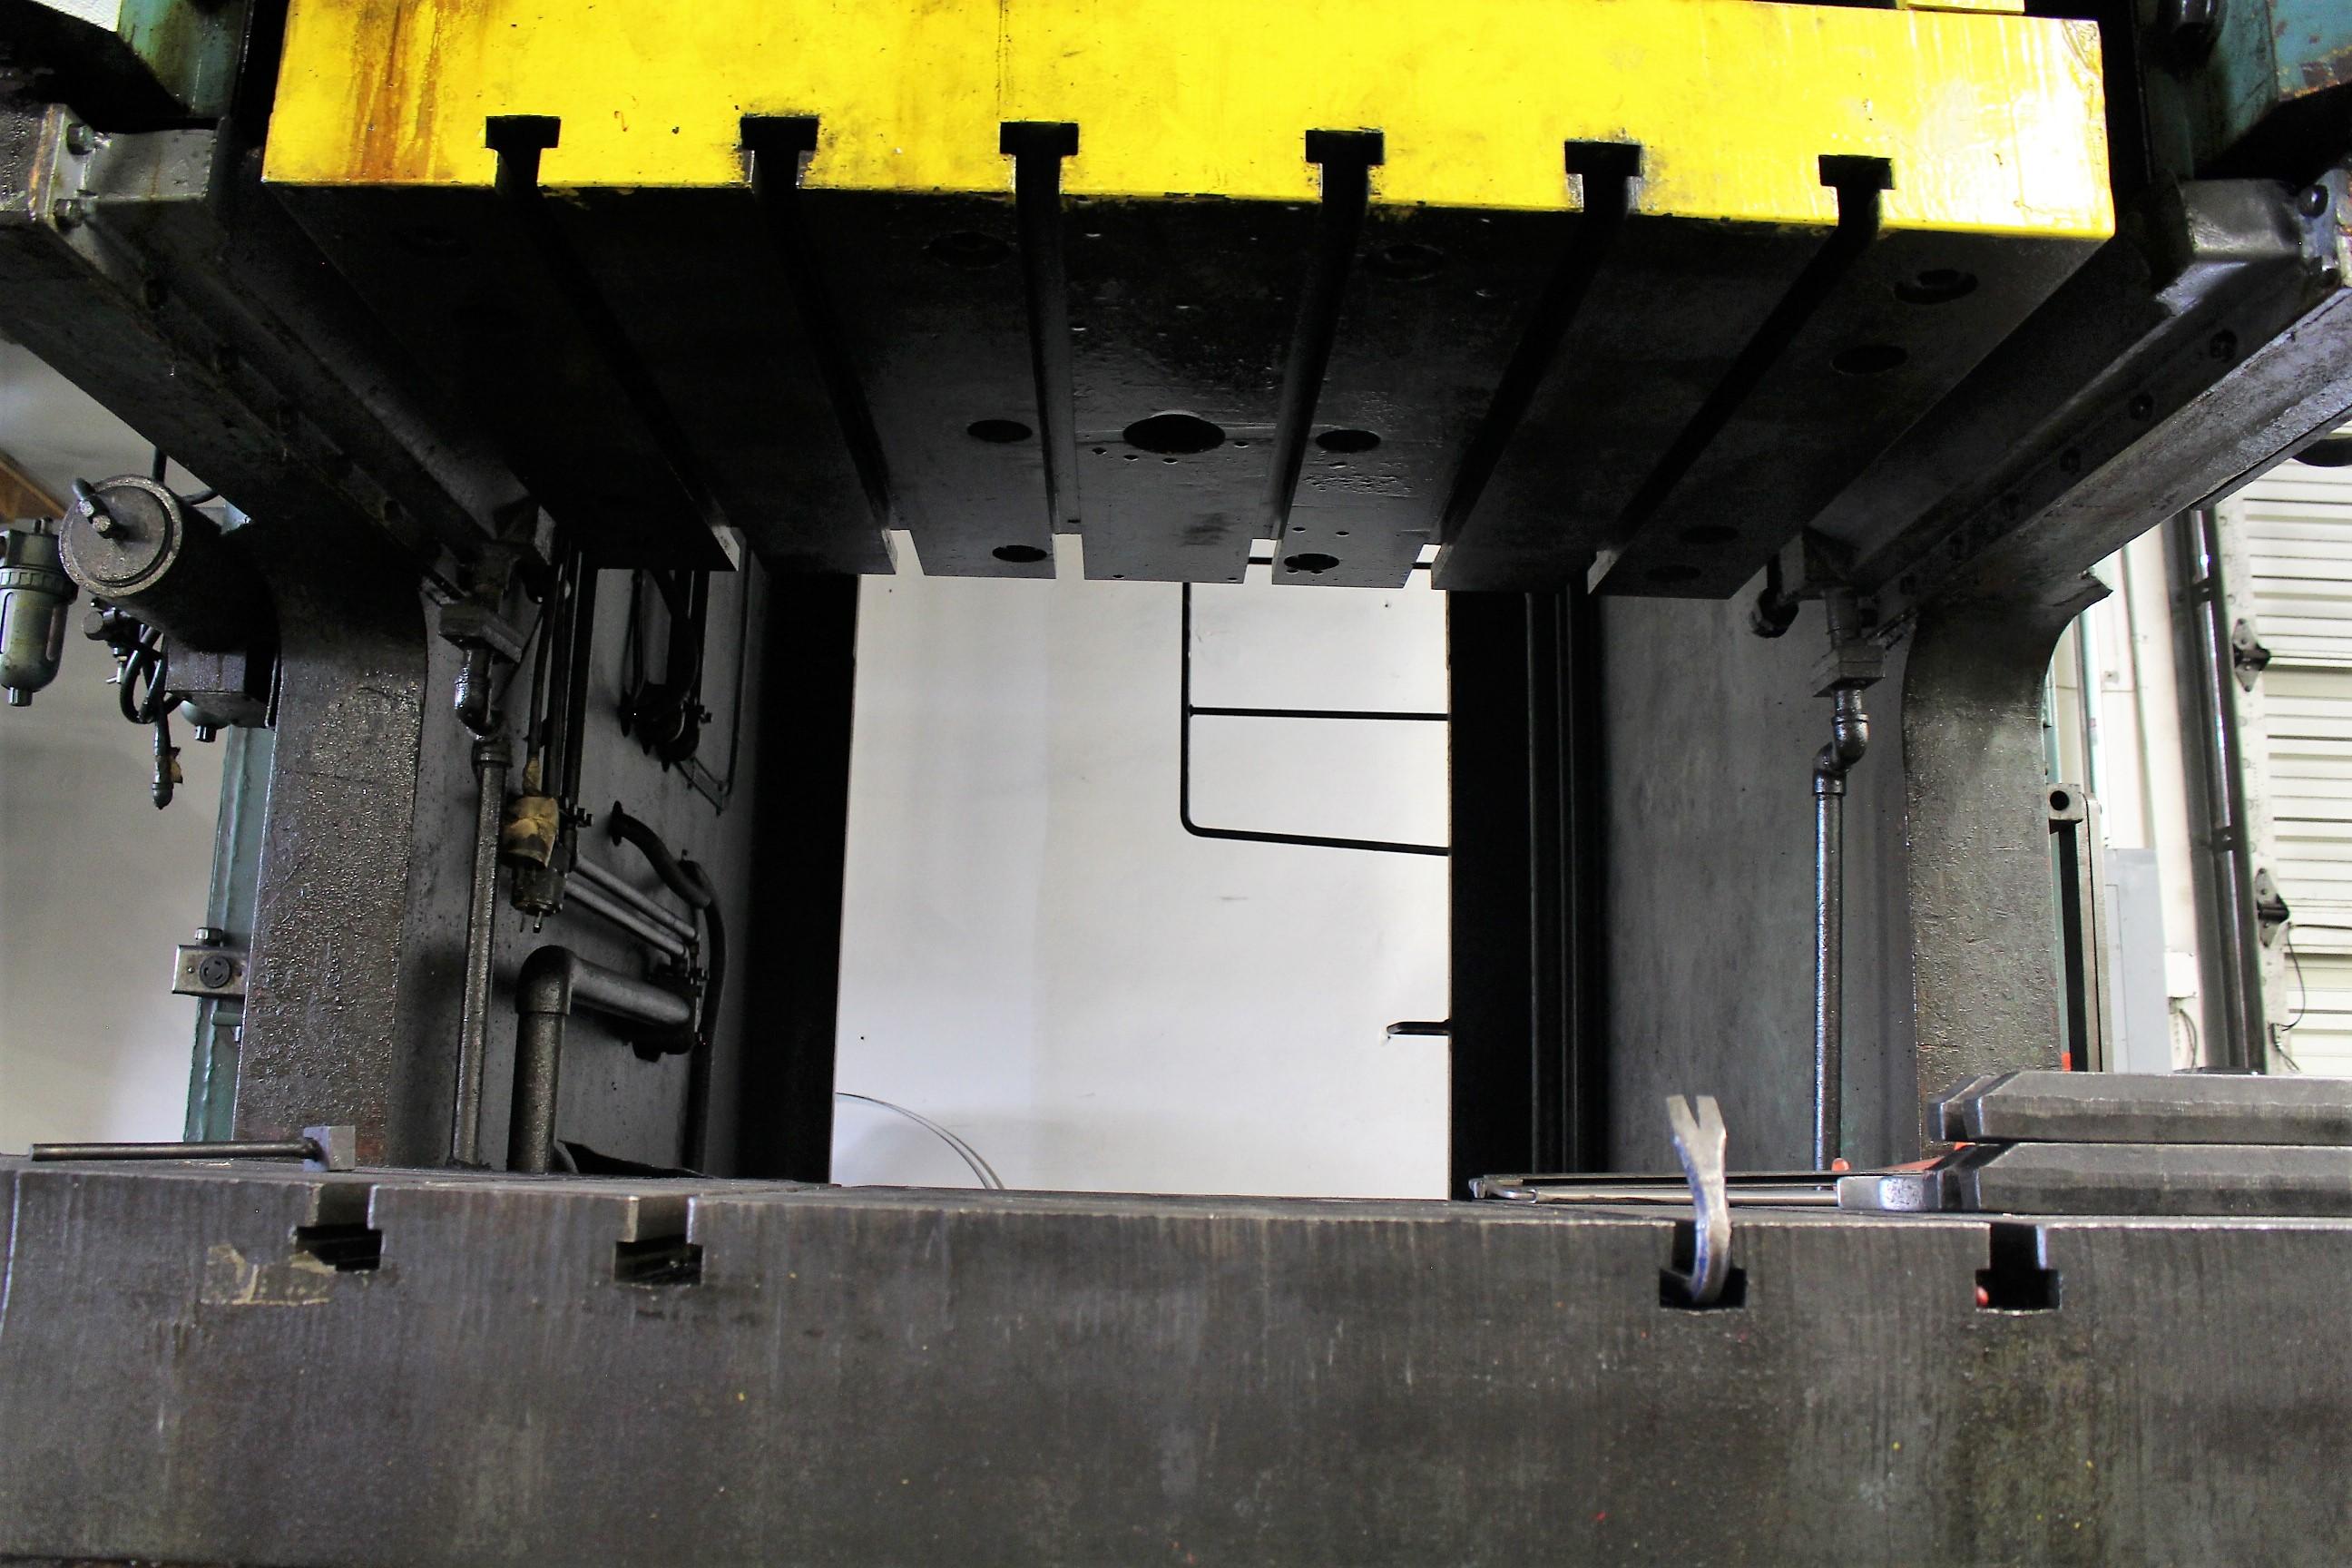 "AIDA MODEL PC-30 PUNCH PRESS, 300 TON CAPACITY,AIR CUSHION, 15.7"" STROKE, 30 SPM, 70"" X 30"" - Image 13 of 21"